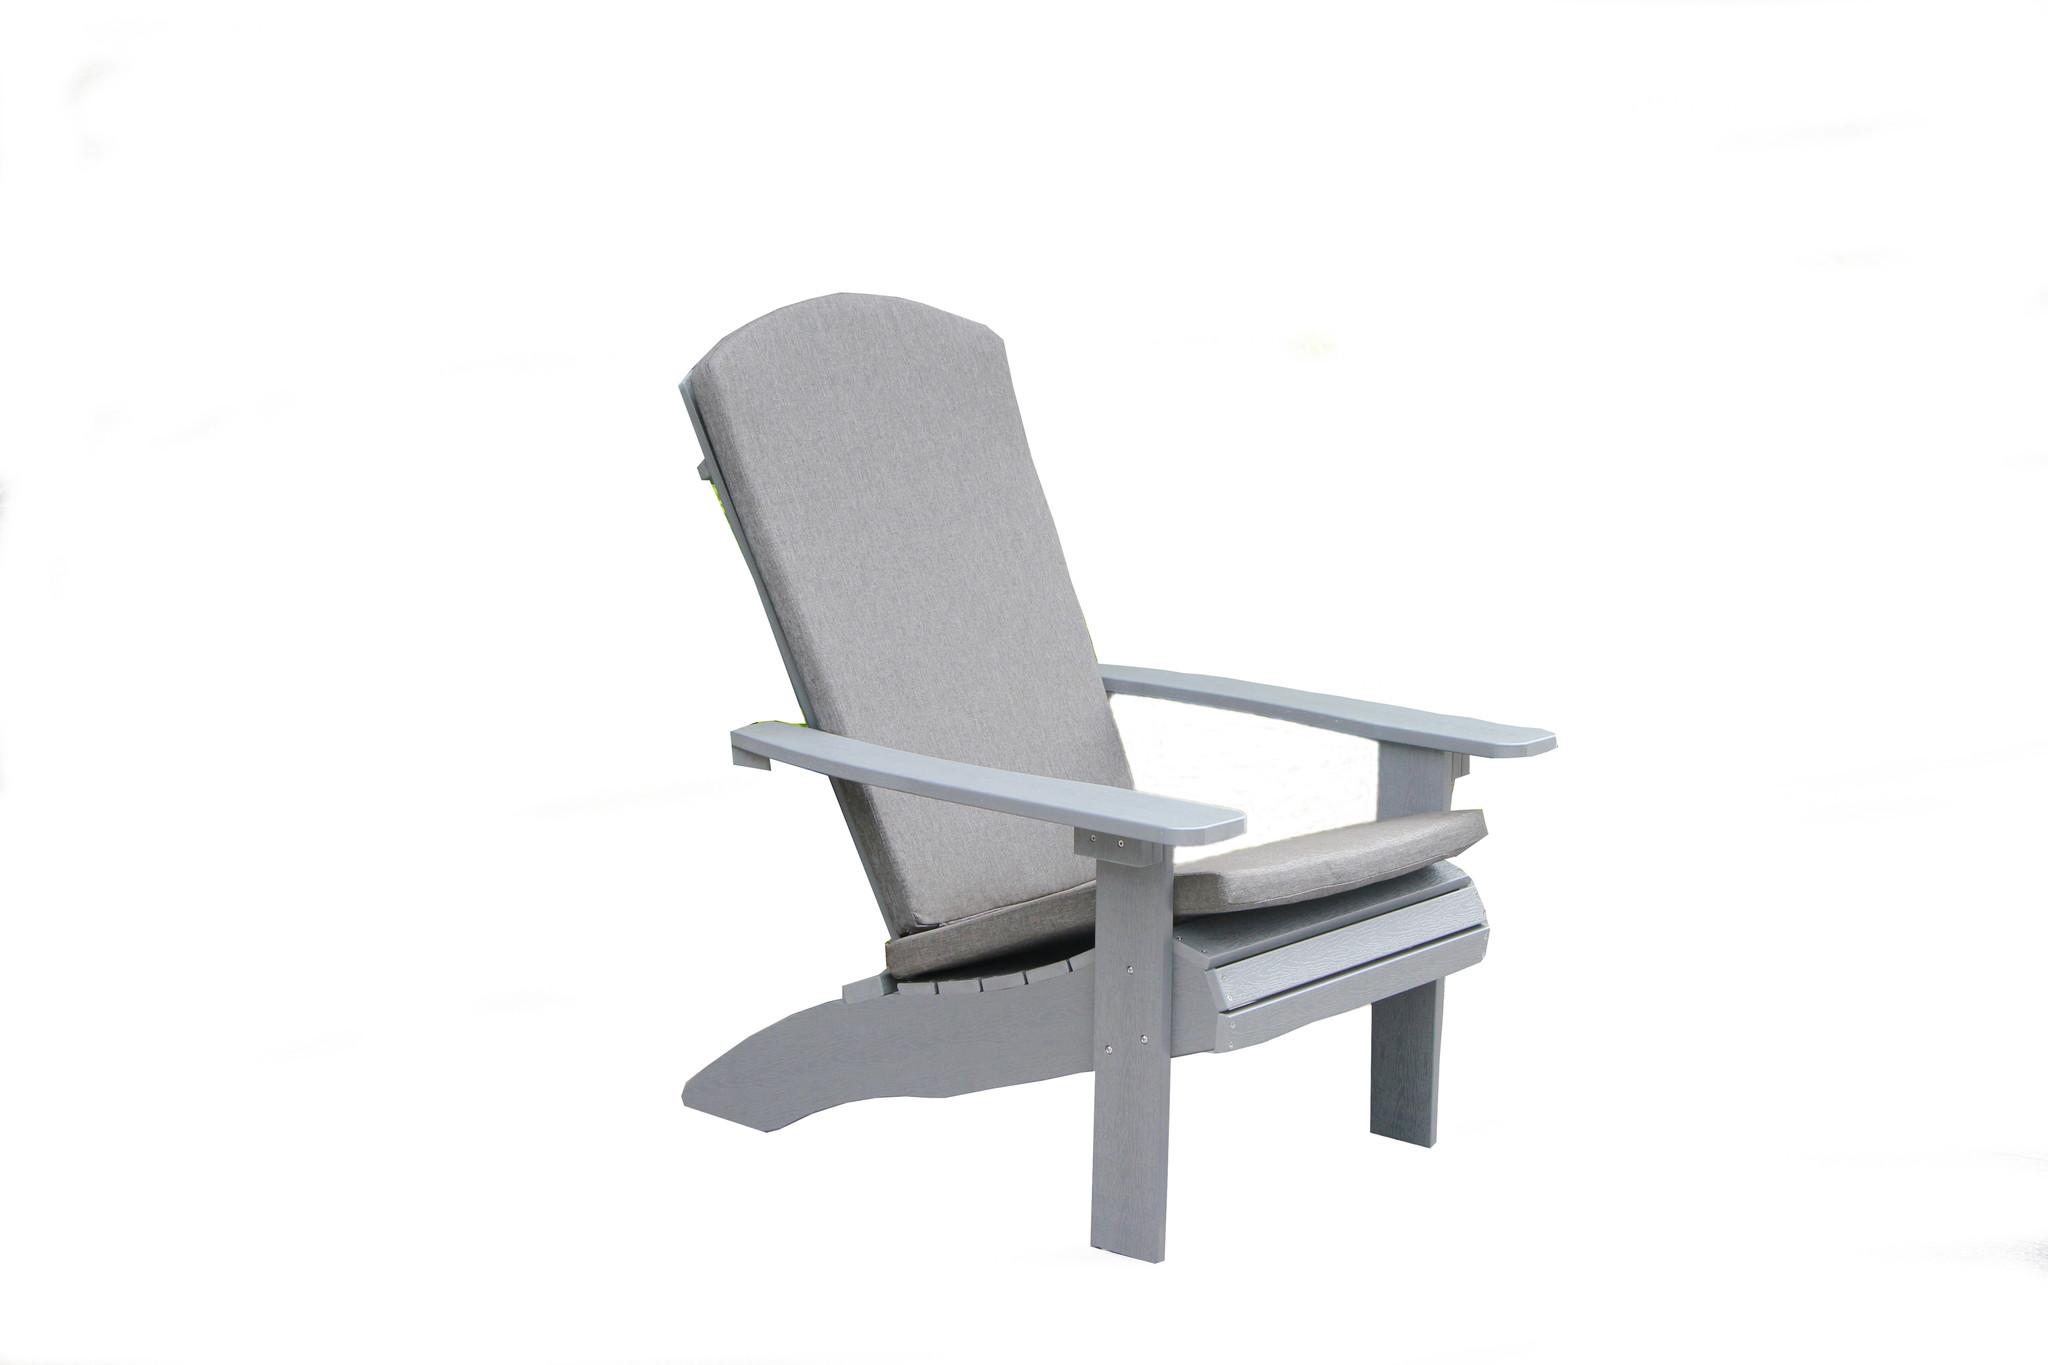 Adirondack Chair Kussens.Garden Interiors Adirondack Kussen Grijs Garden Interiors